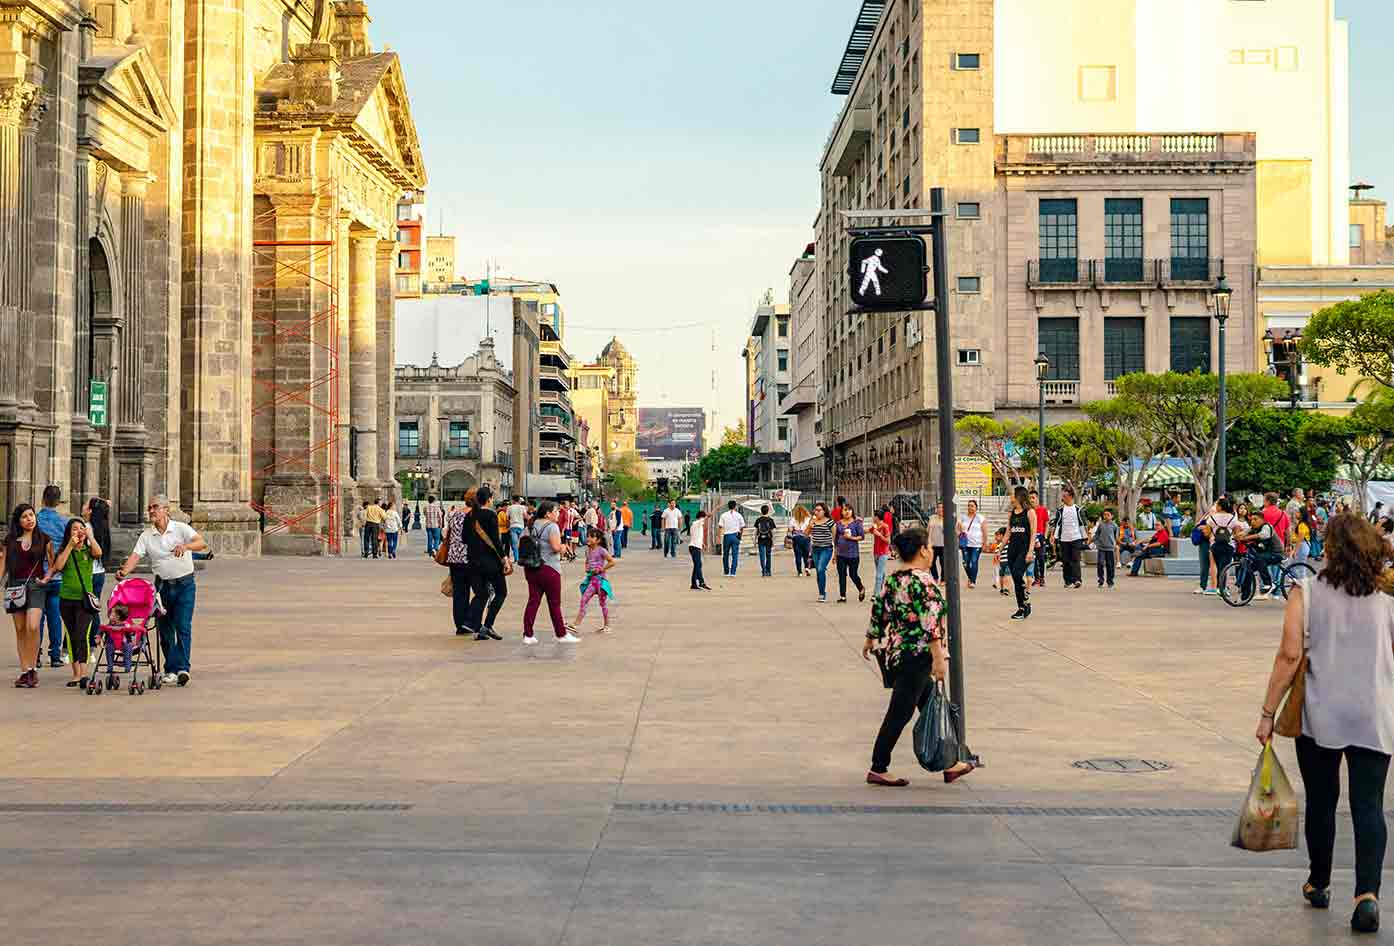 guadalajara vs mexico city